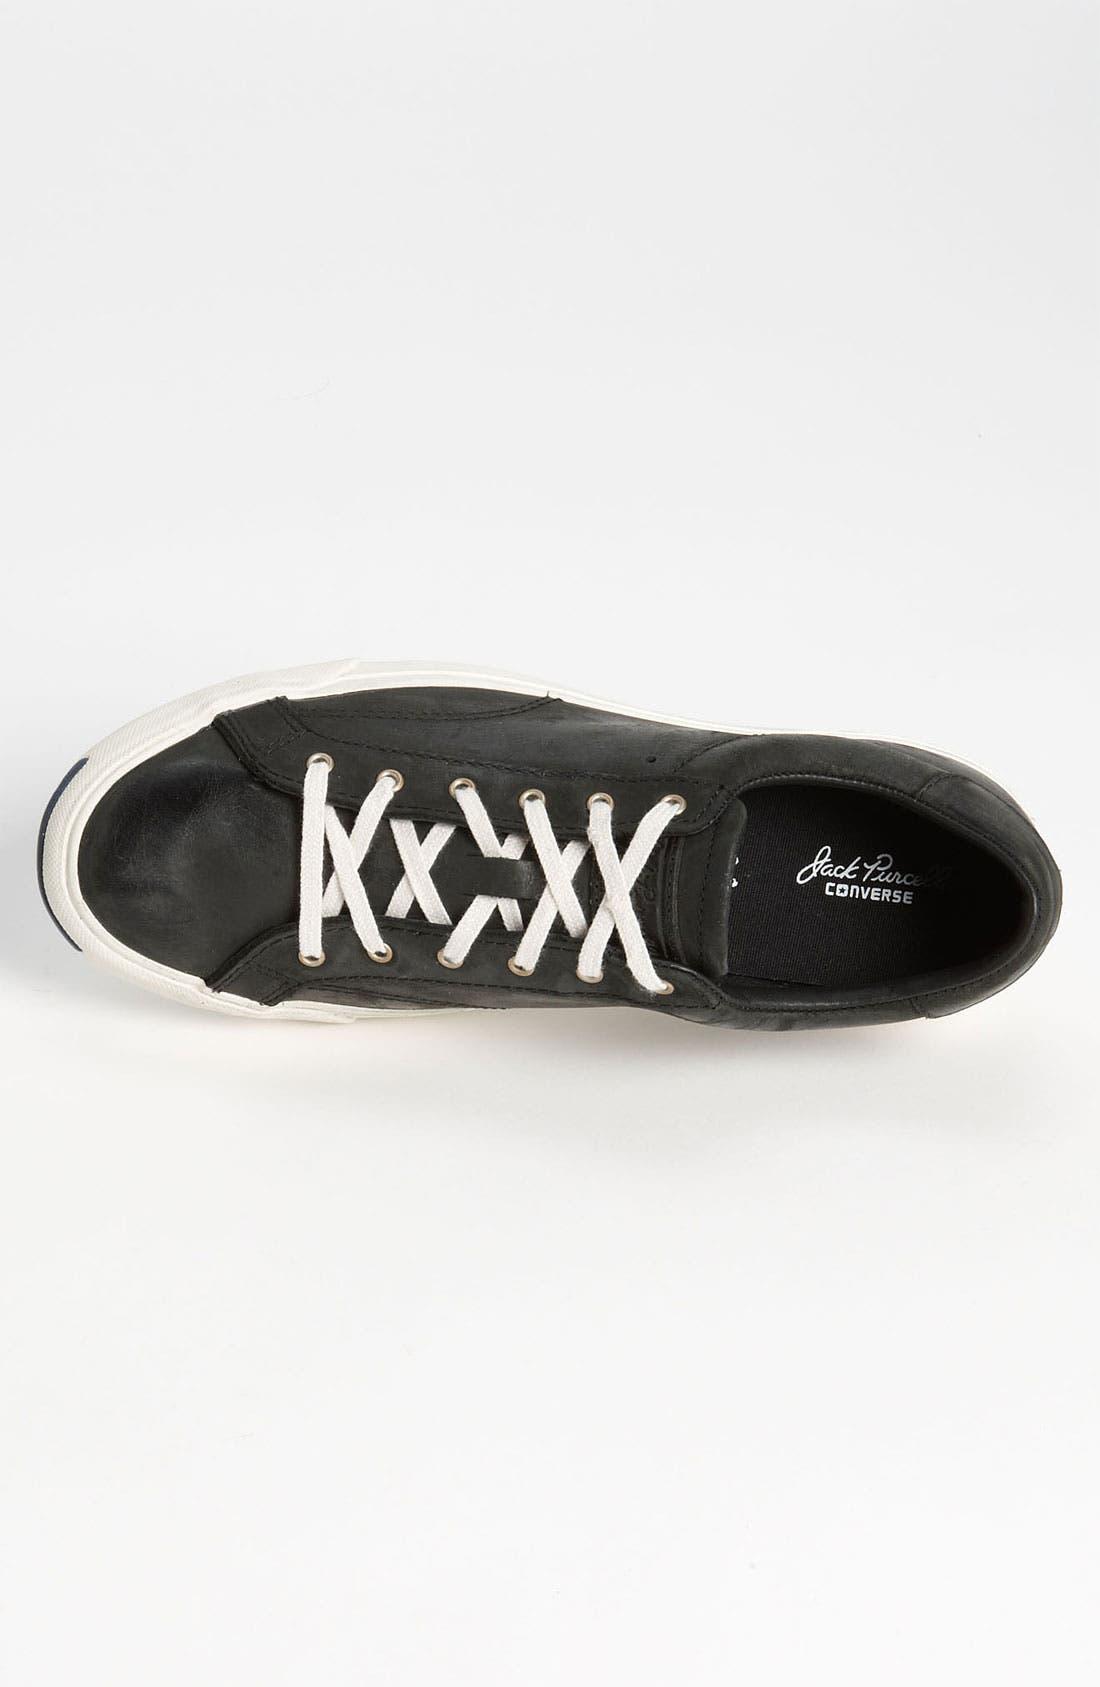 Alternate Image 3  - Converse 'Jack Purcell - Peter' Sneaker (Unisex)